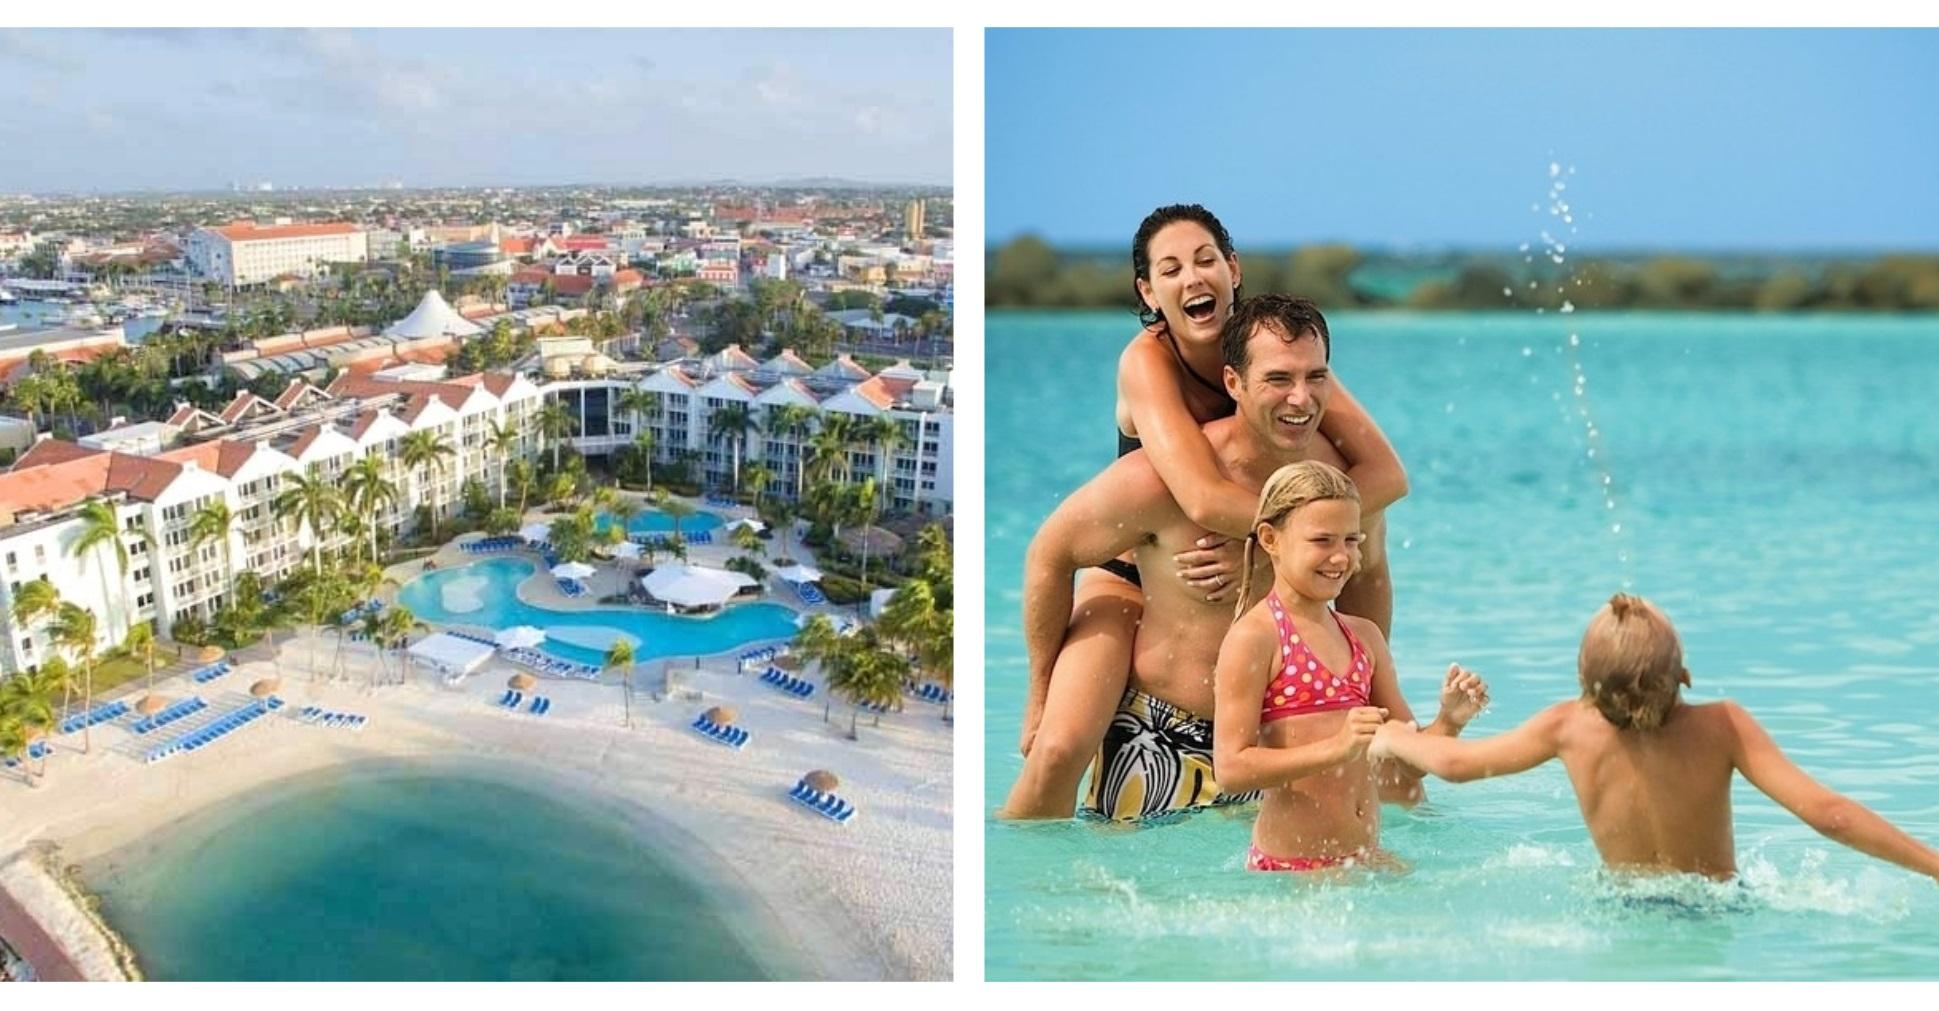 Family-friendly wedding vacations | Aruba Destination Wedding | Beach Brides Aruba